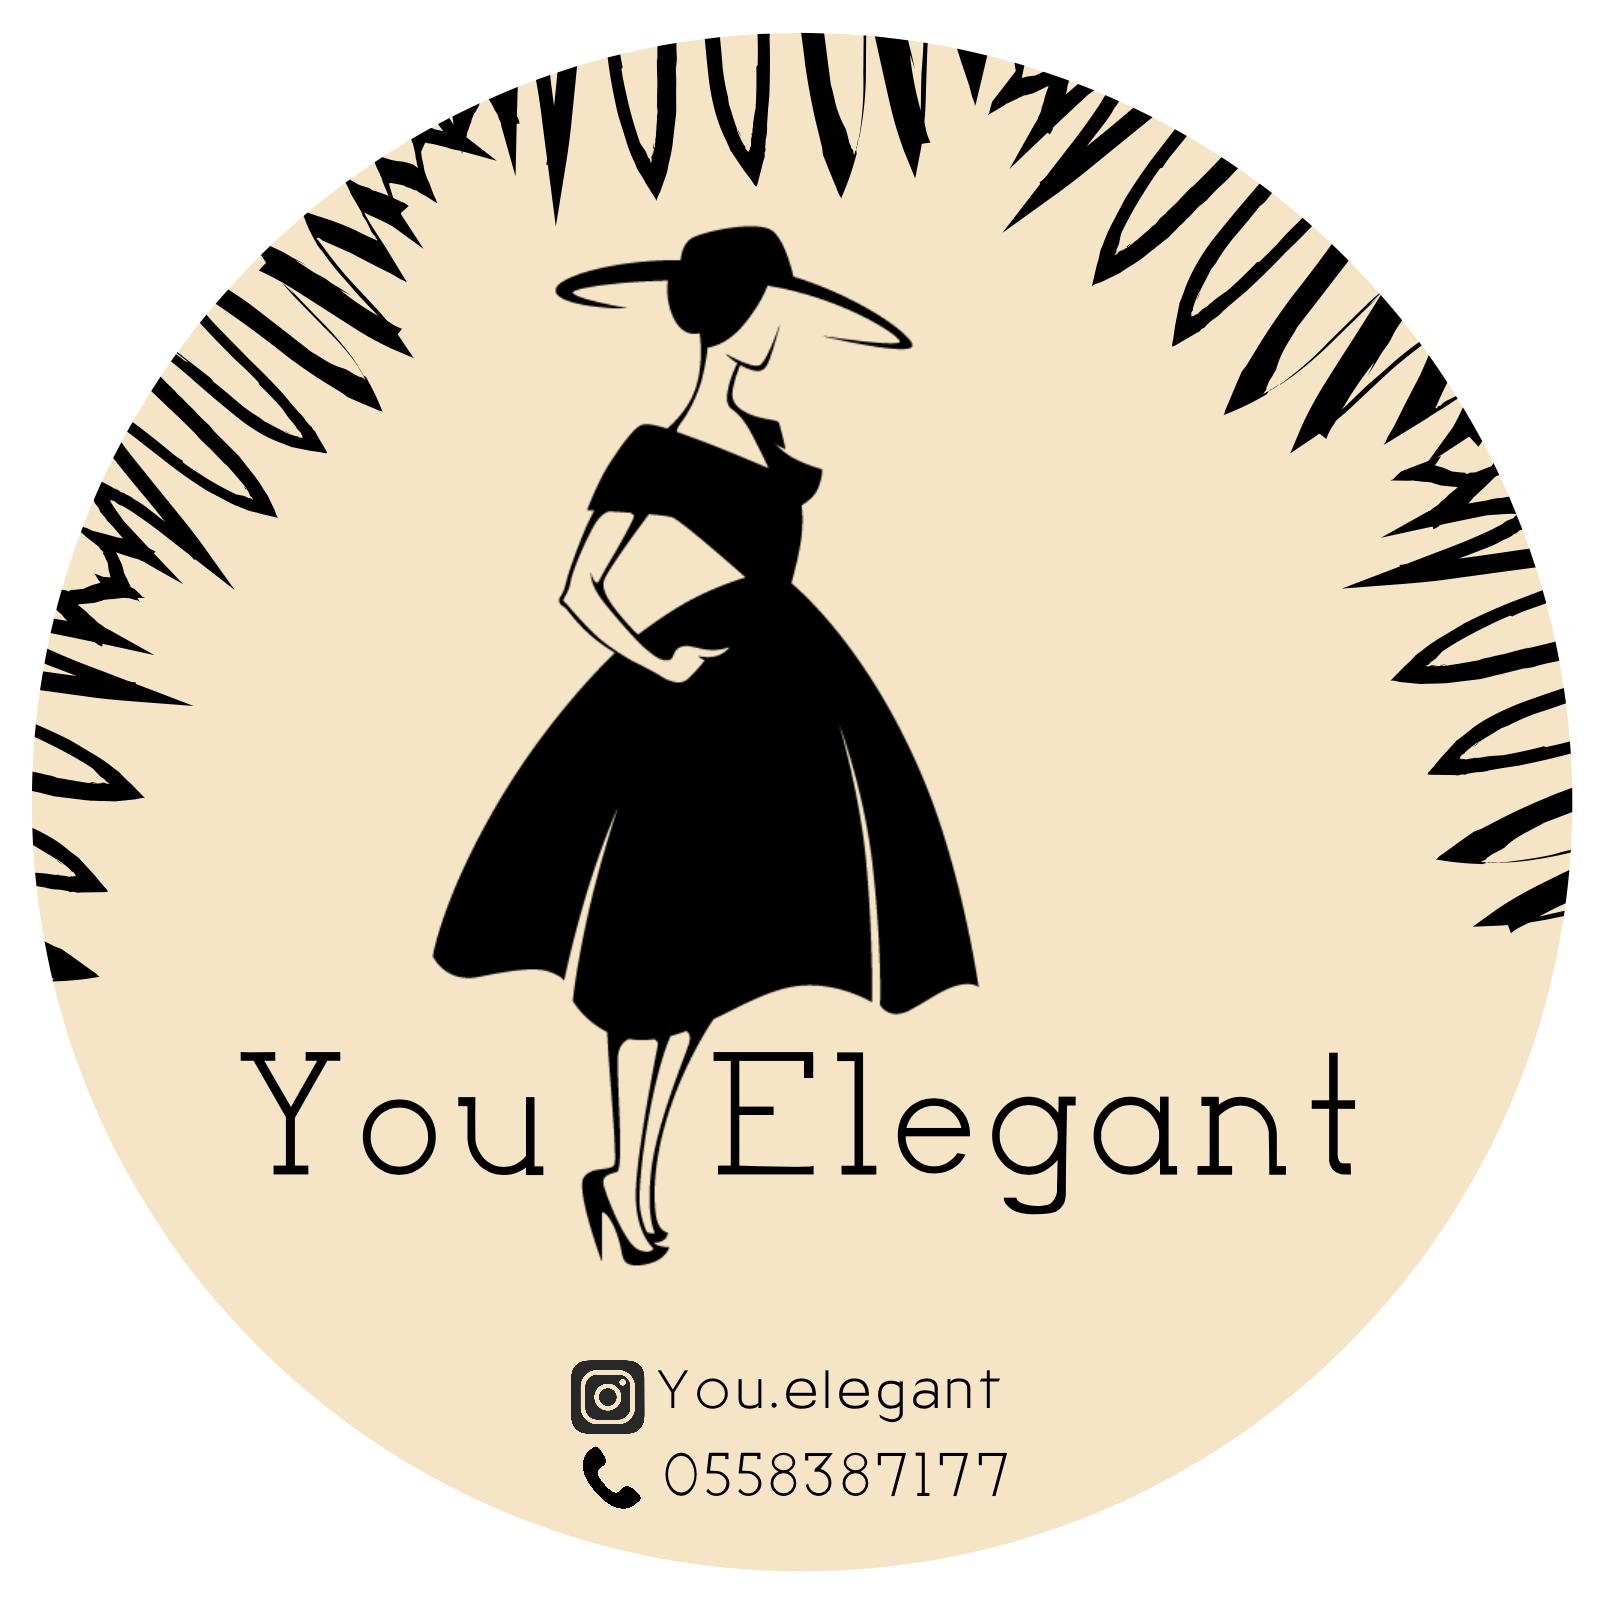 You Elegant